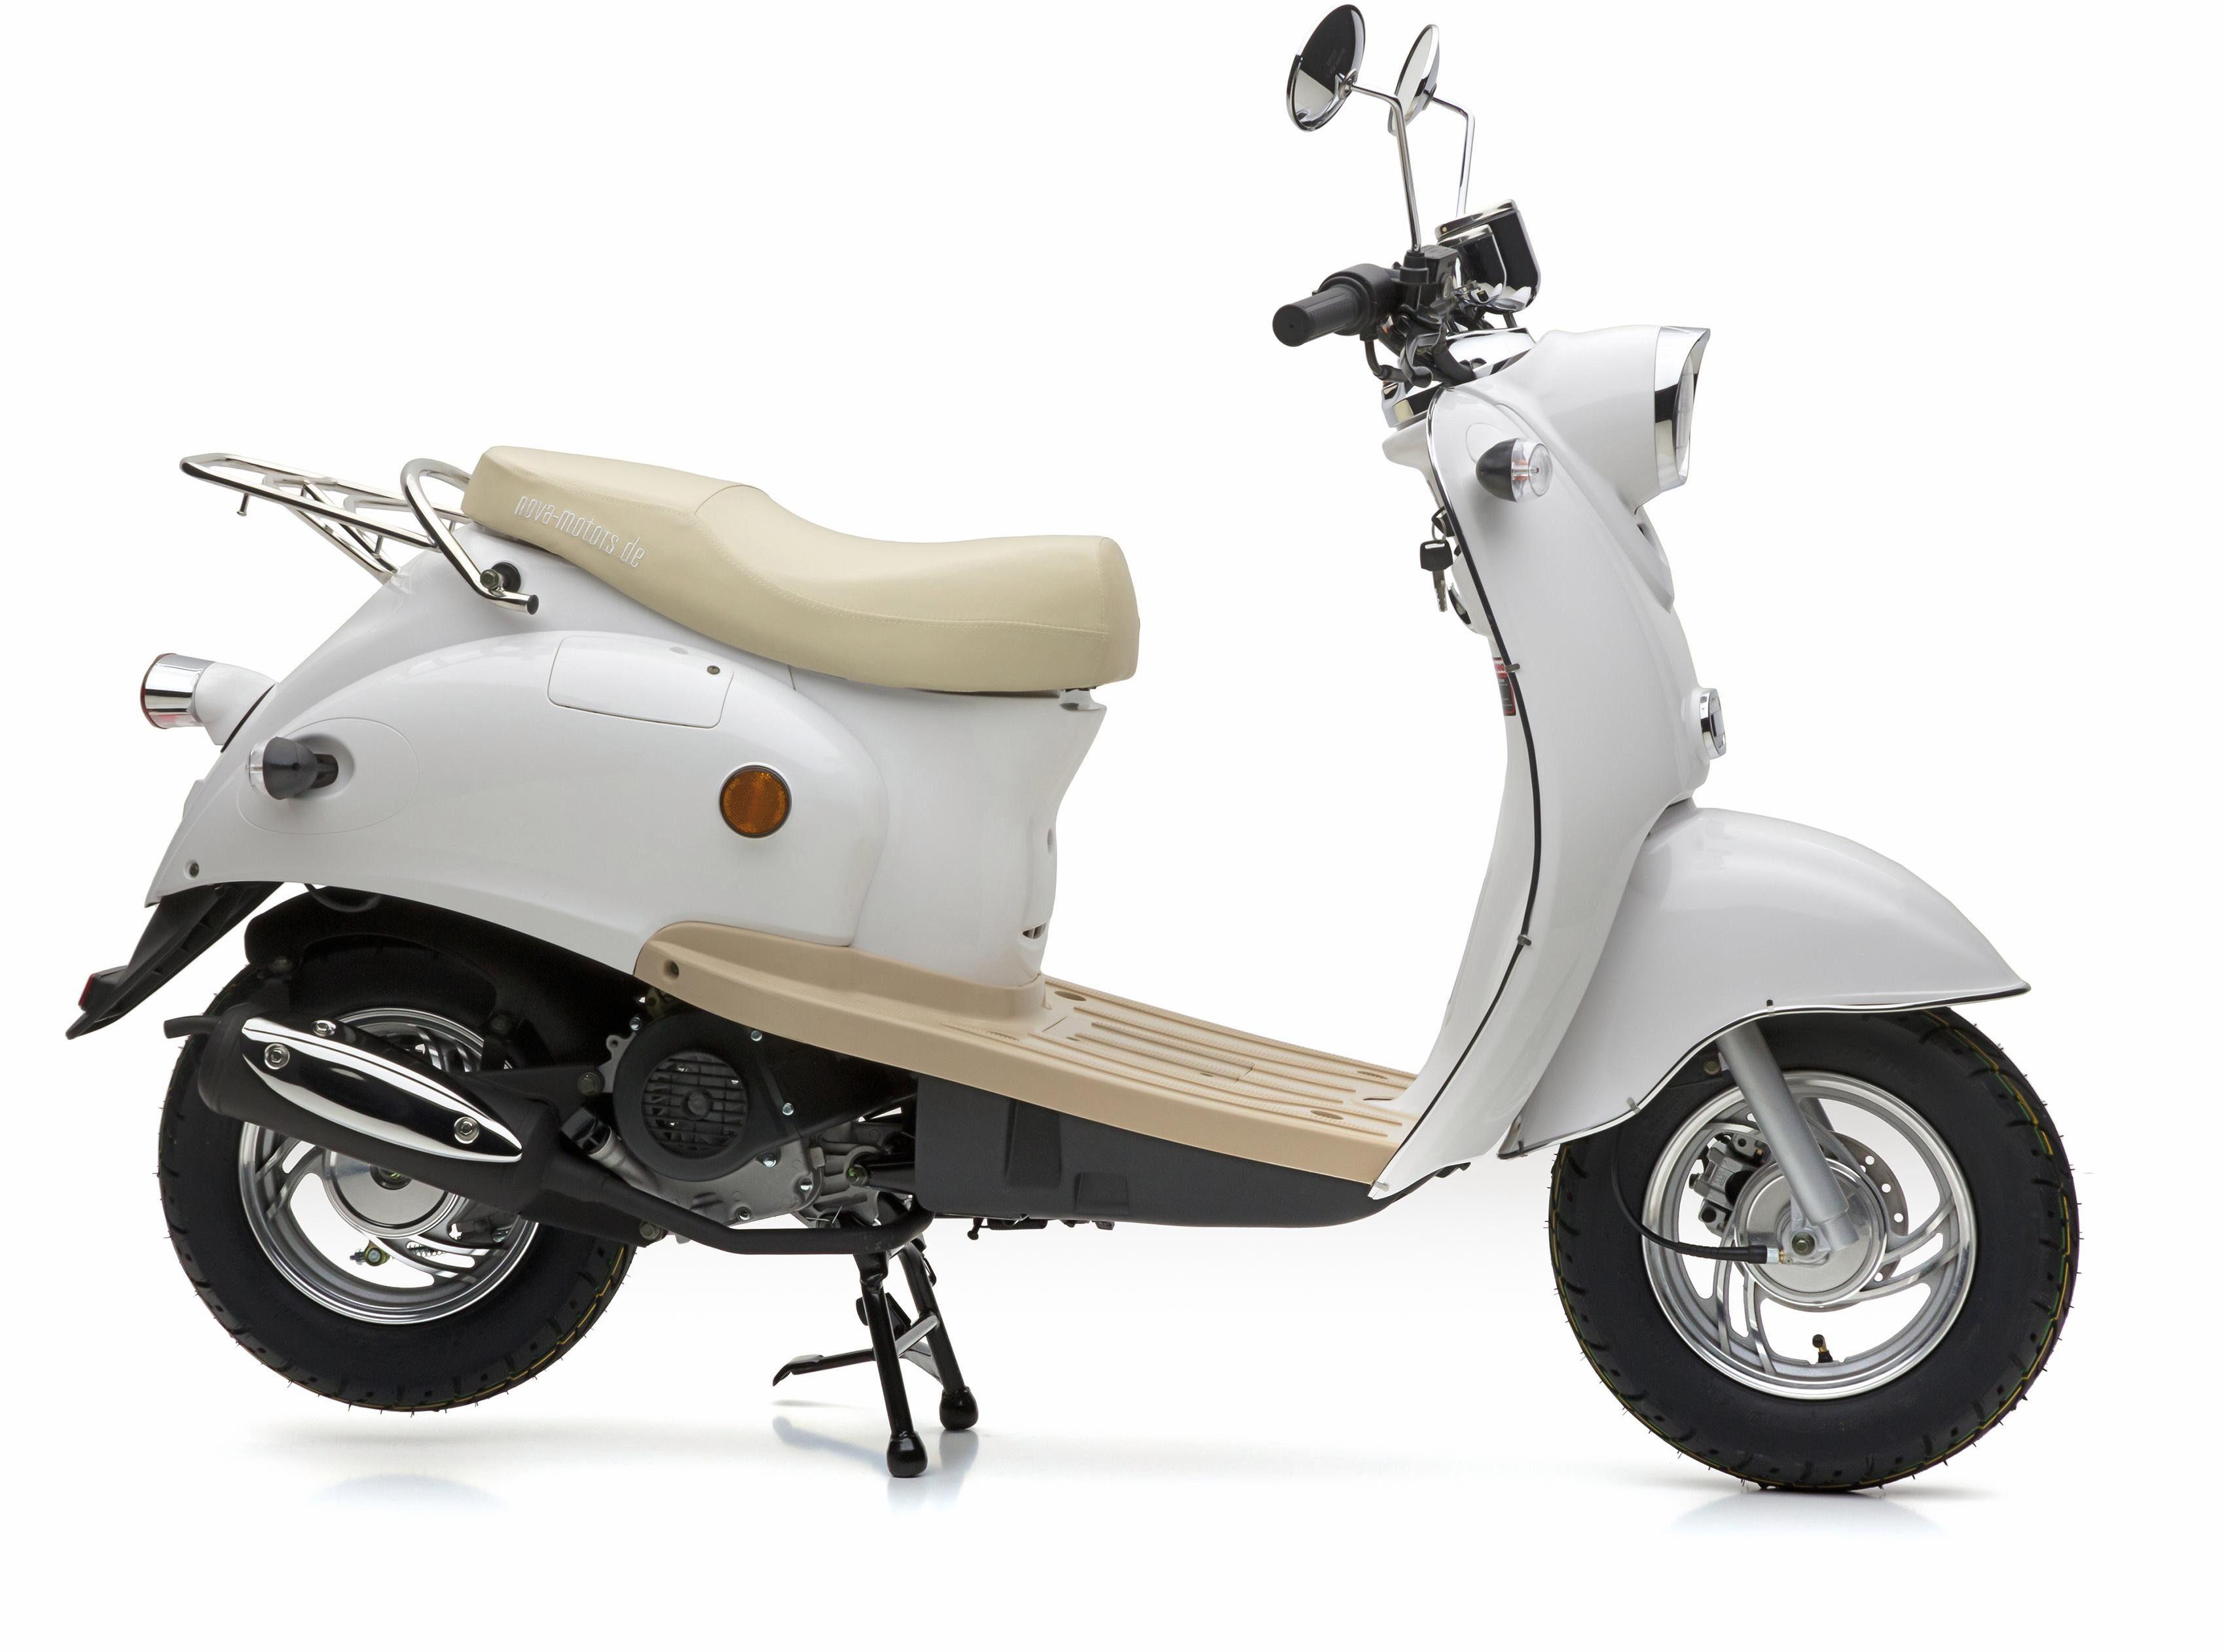 Nova Motors Mofaroller »Retro Star«, 49 ccm, 25 km/h, Euro 4, 49 ccm, 25 km/h